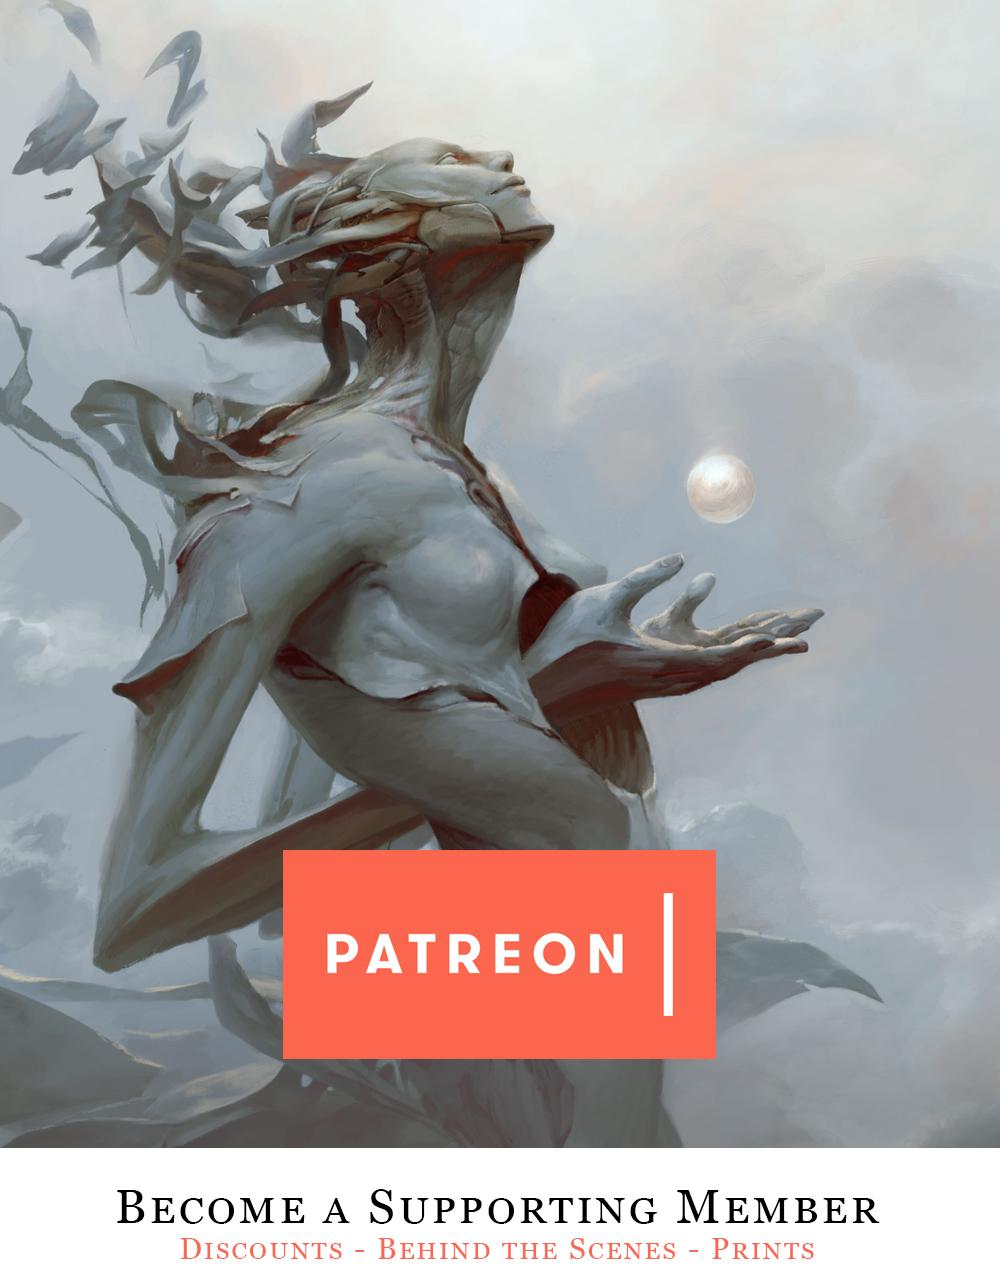 patreon-block-banner.jpg